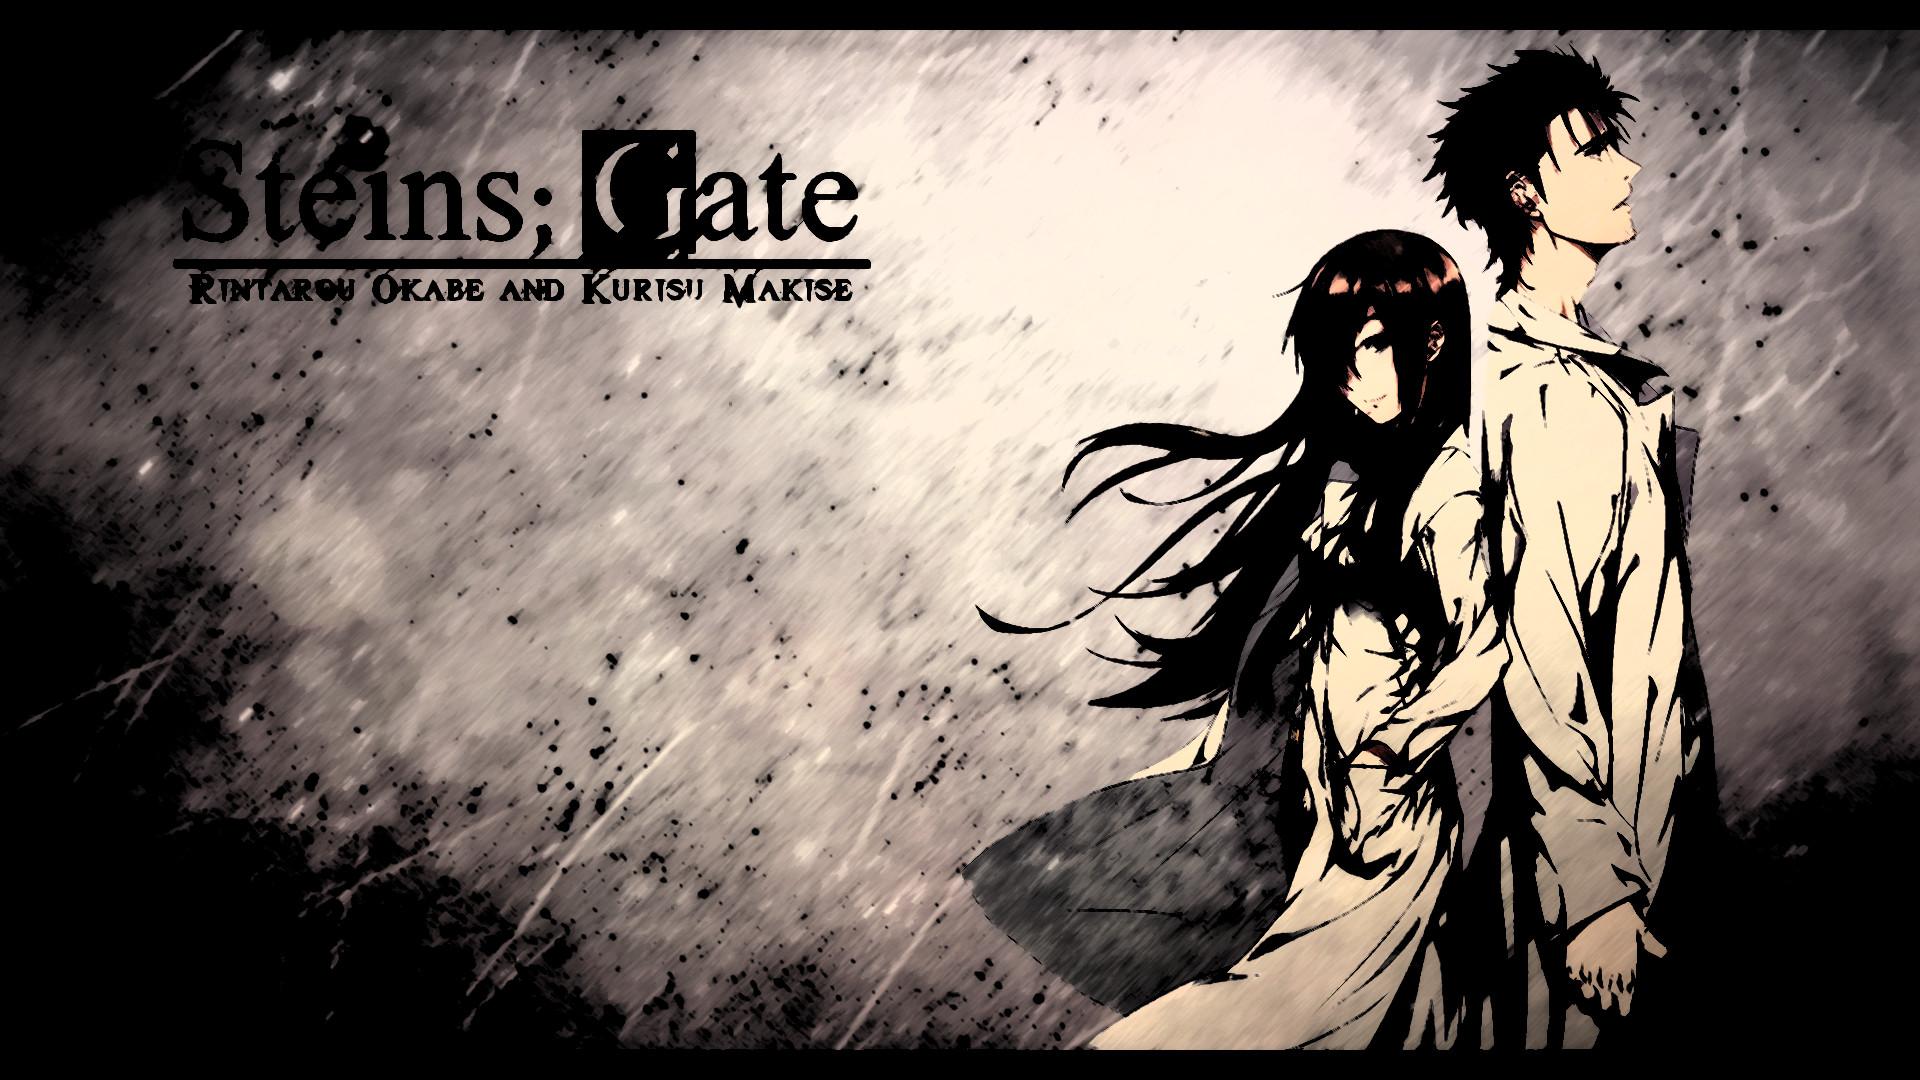 Steins Gate Wallpaper HD (71+ images)